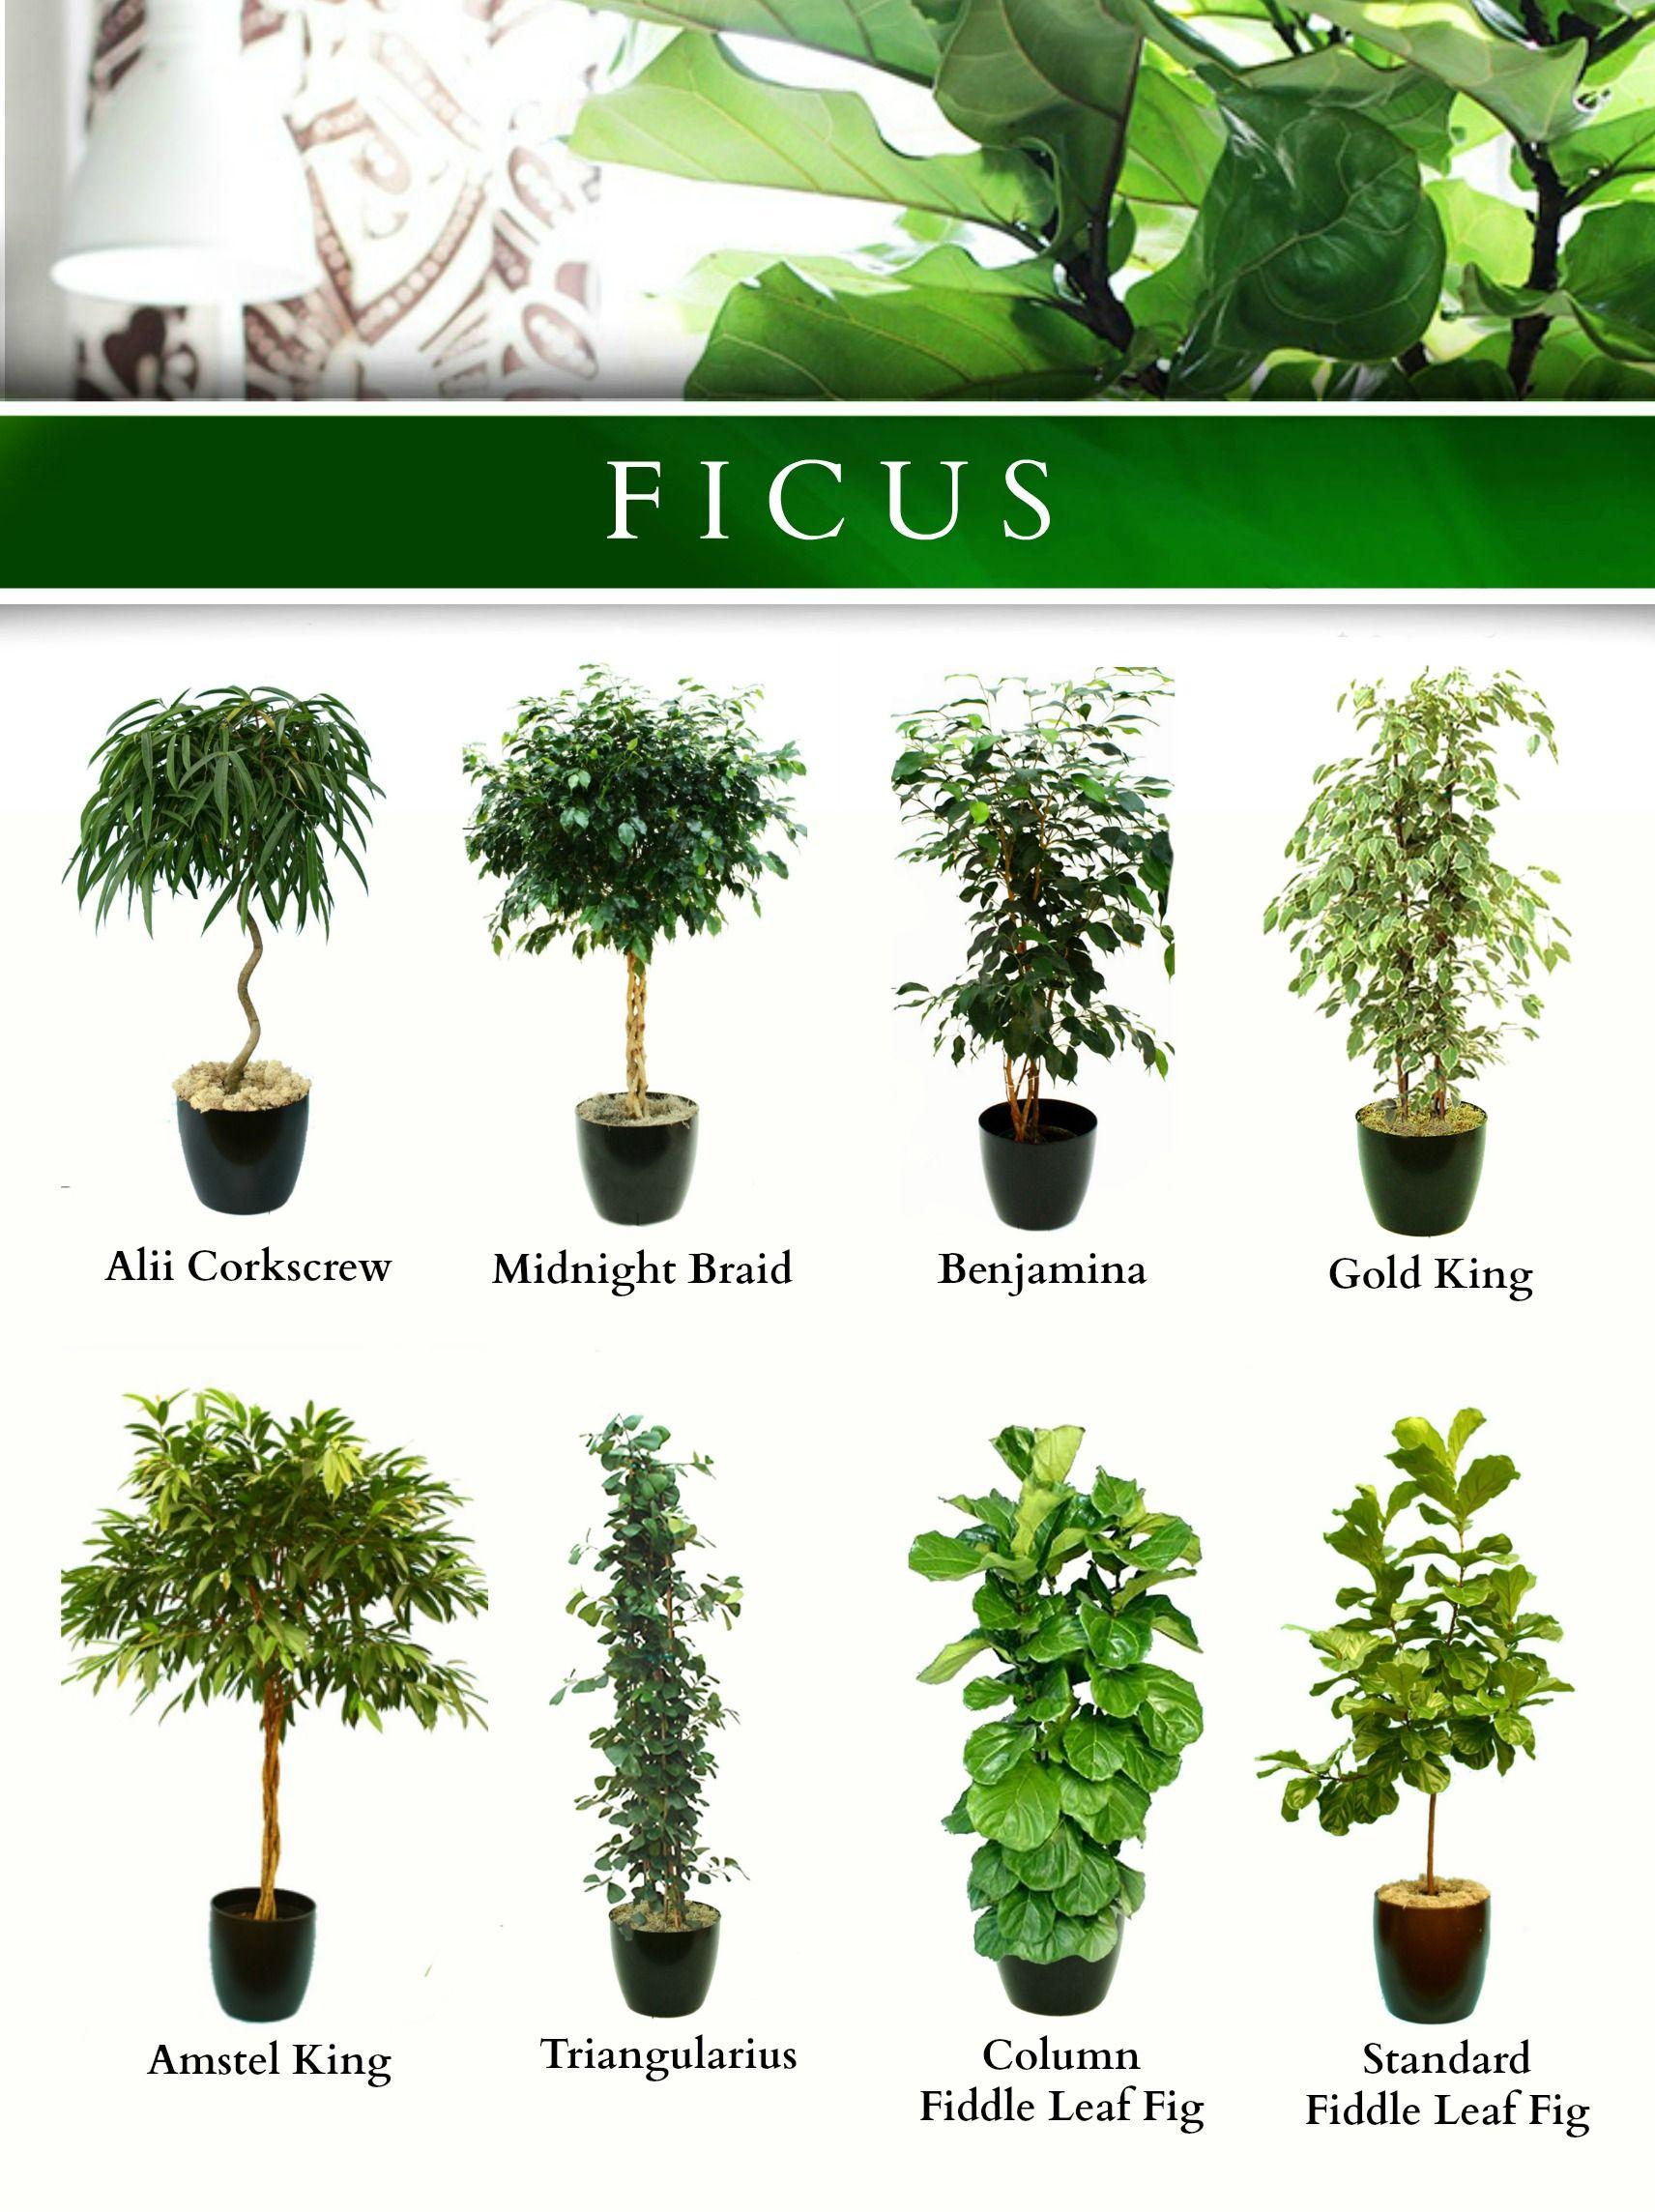 Olympus Digital Camera Plants Indoor Plants Trees To Plant